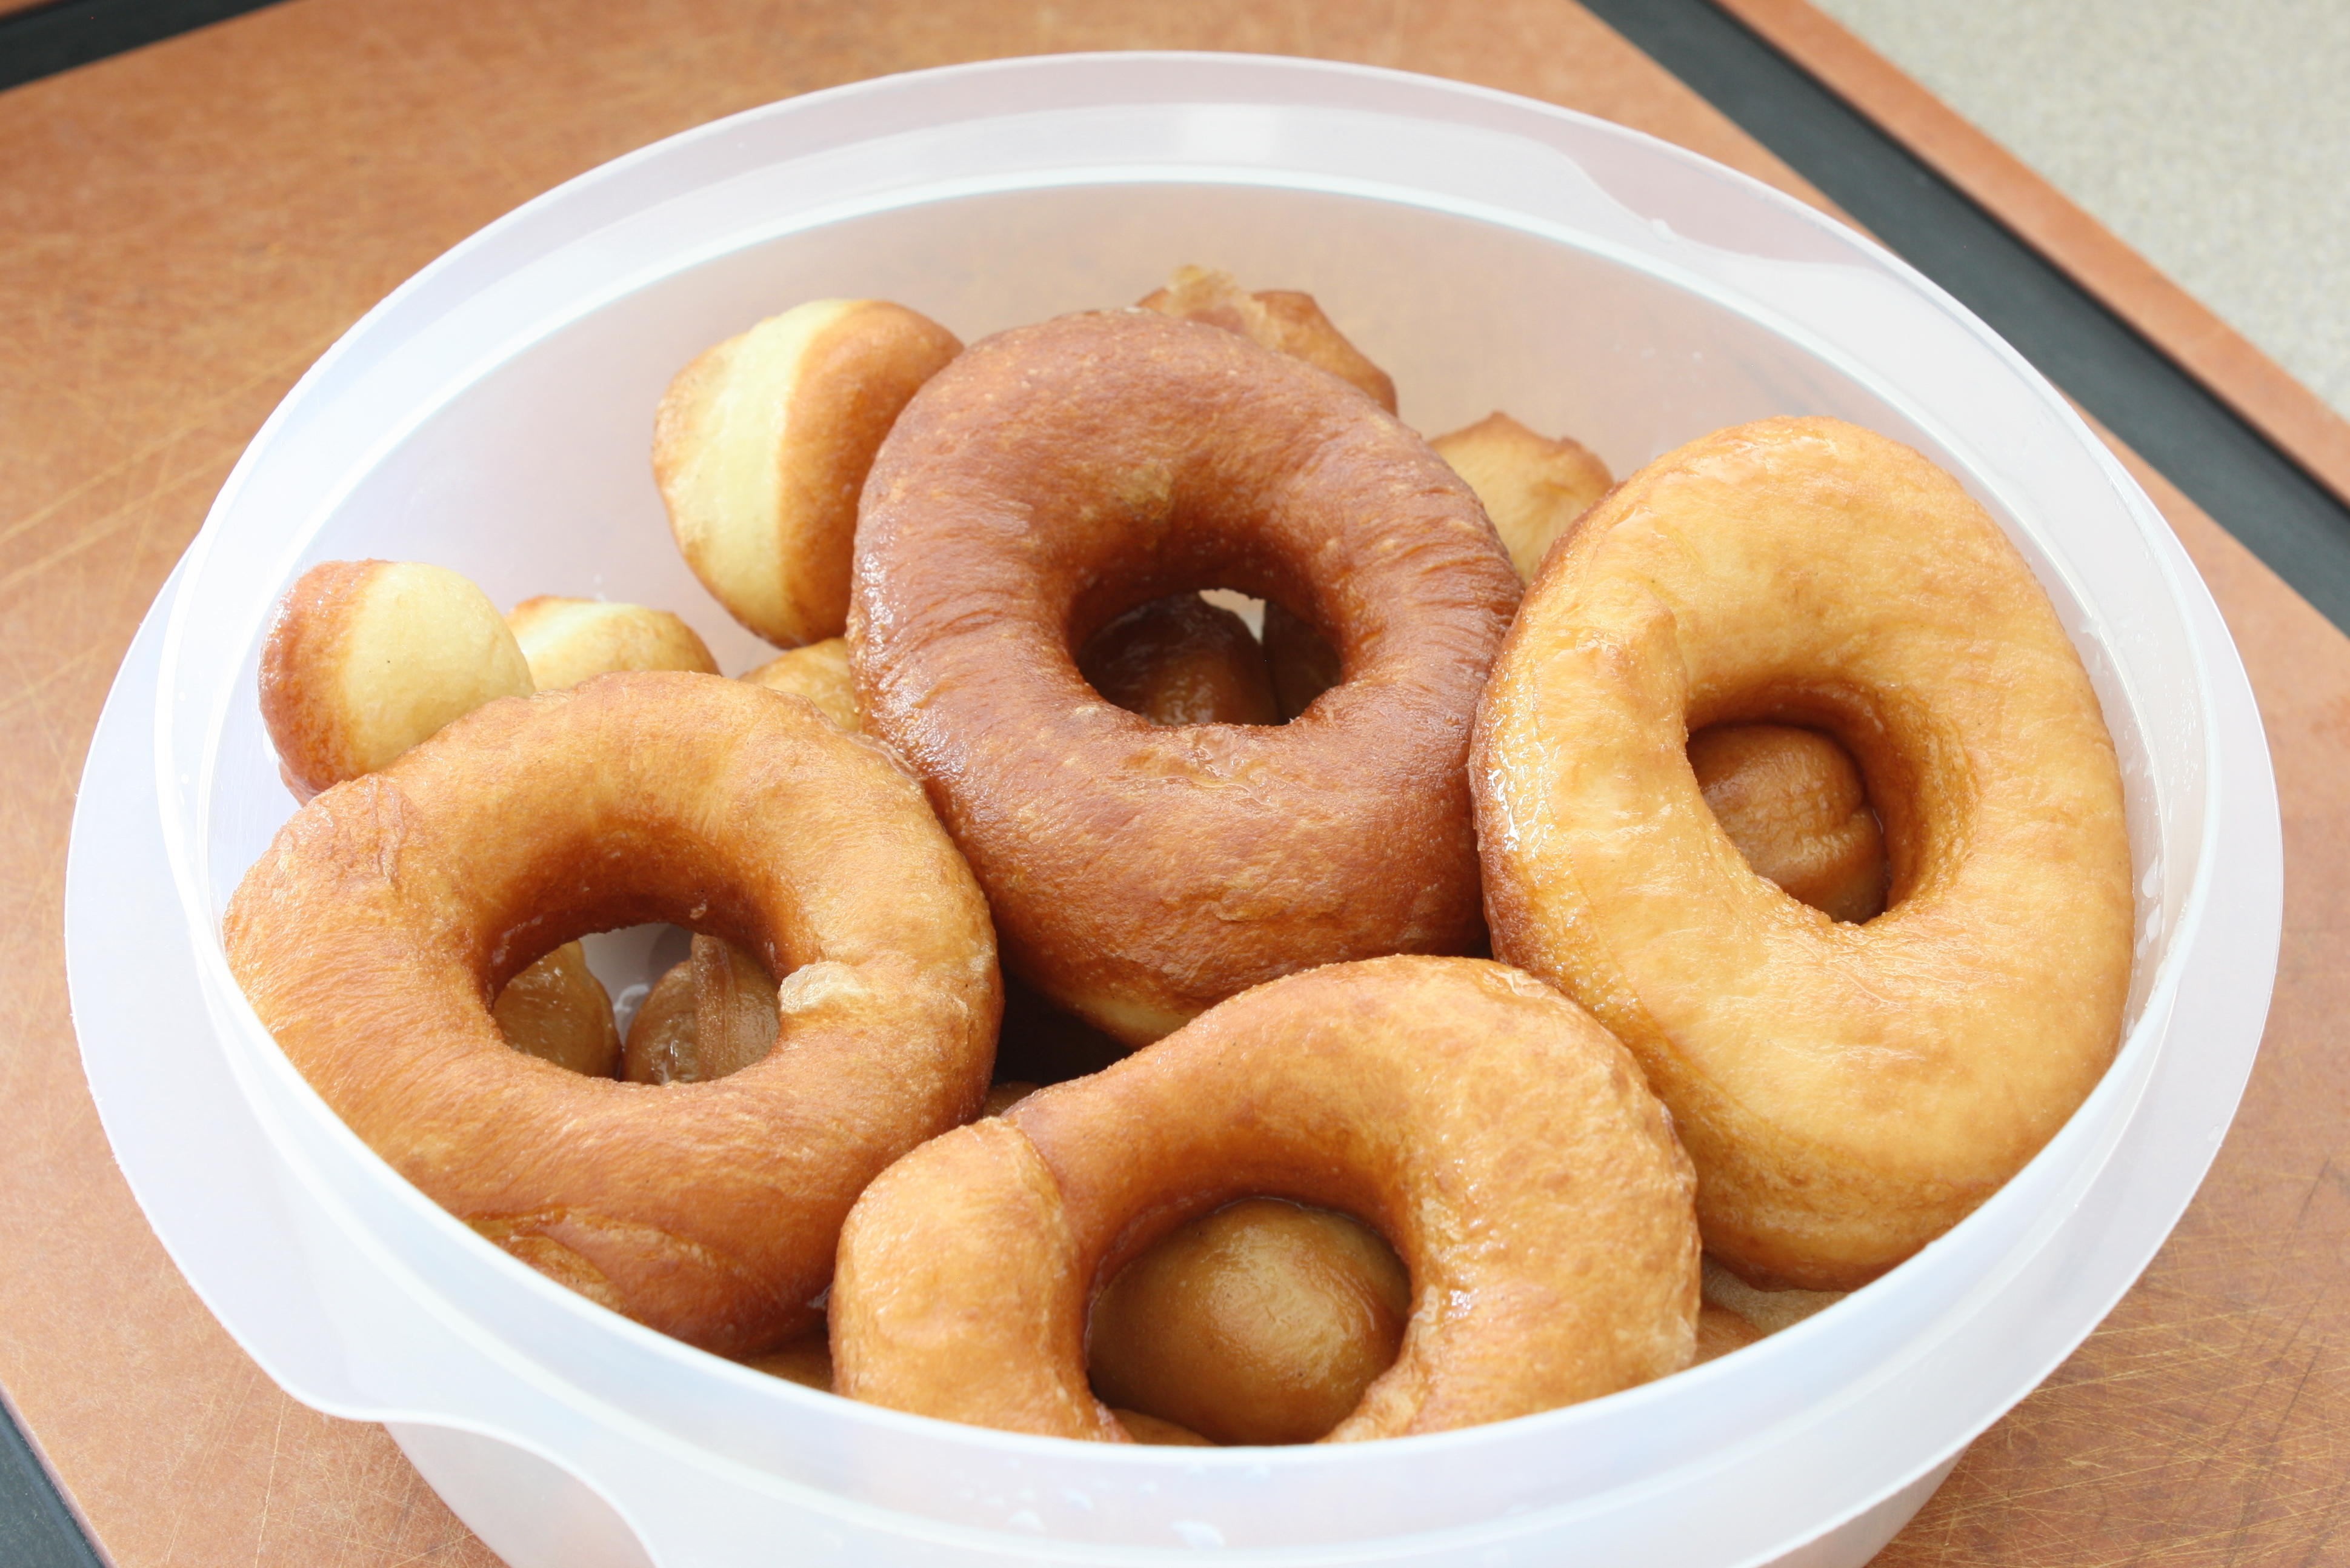 Homemade Yeast Doughnuts Recipes — Dishmaps